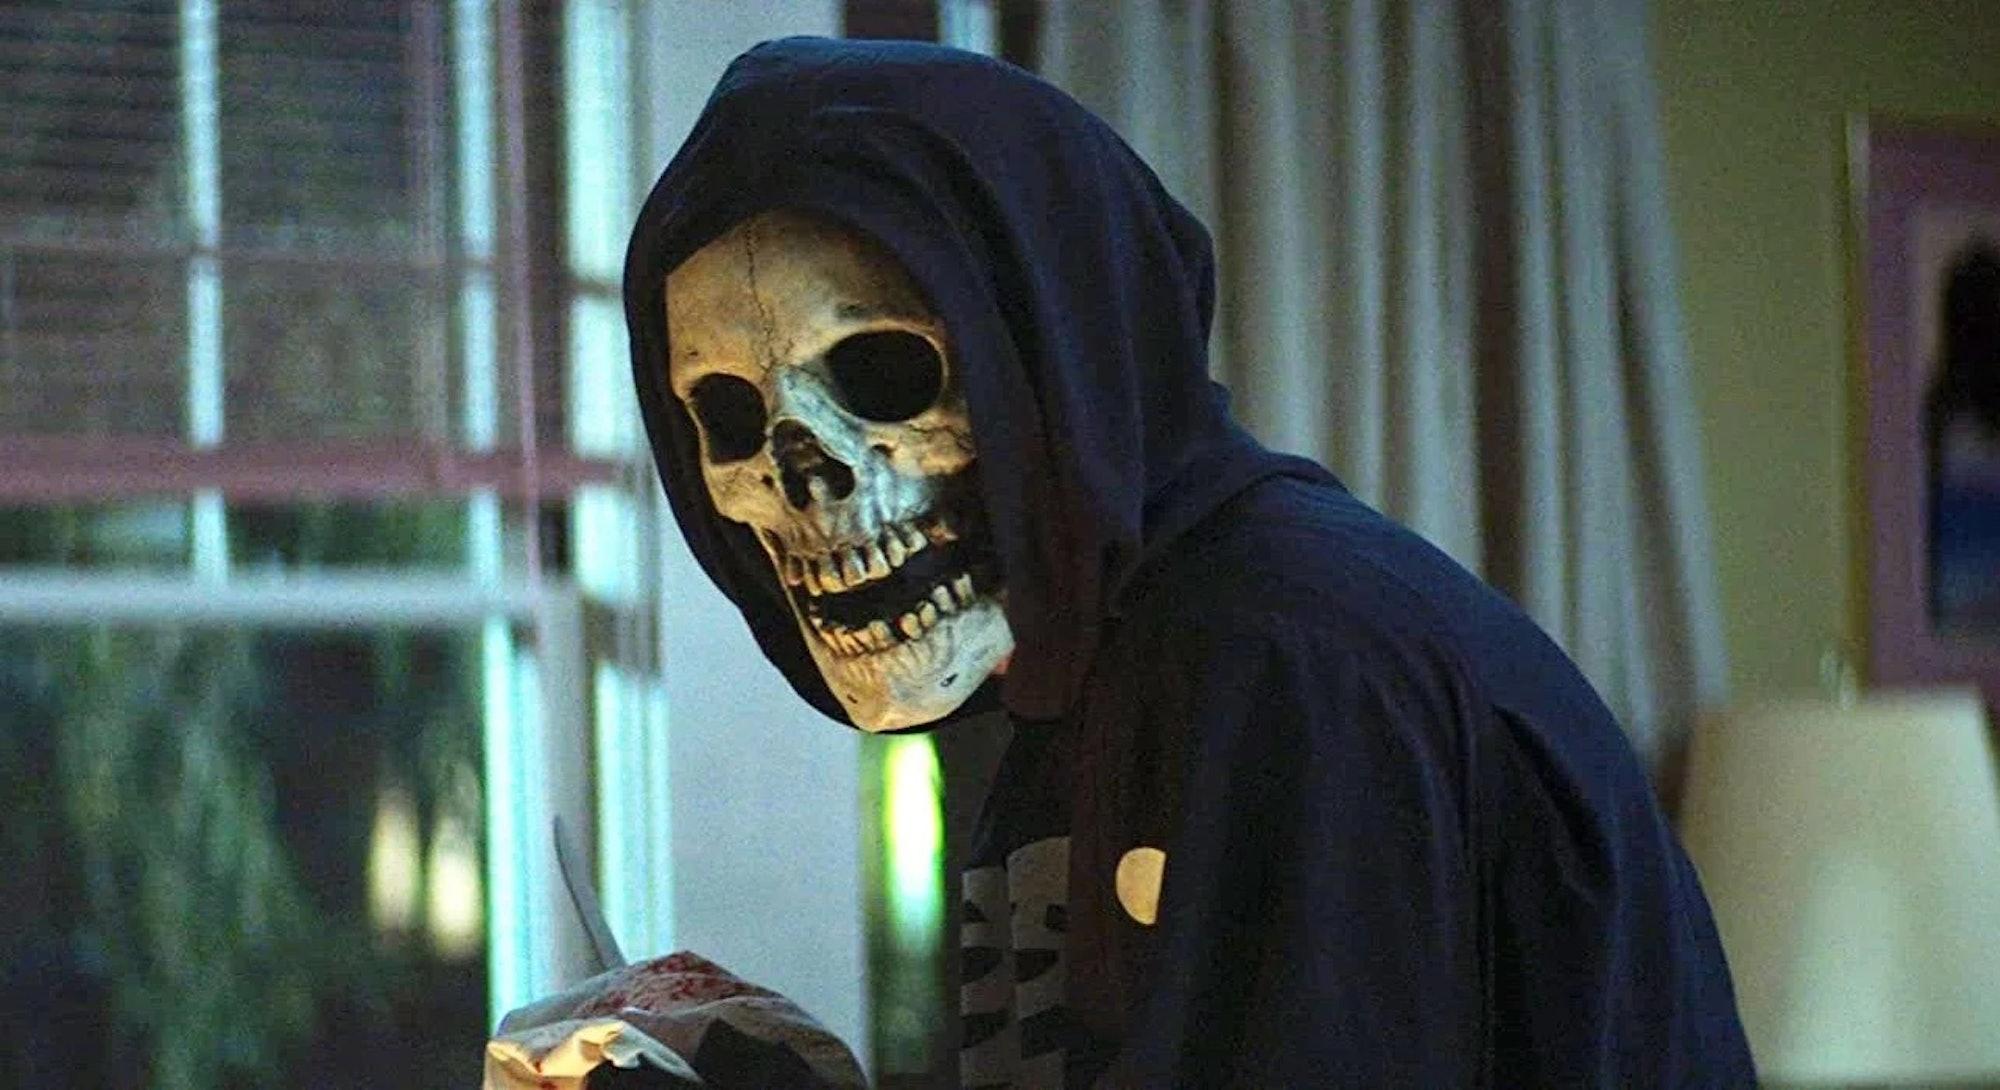 killer in skull mask from fear street